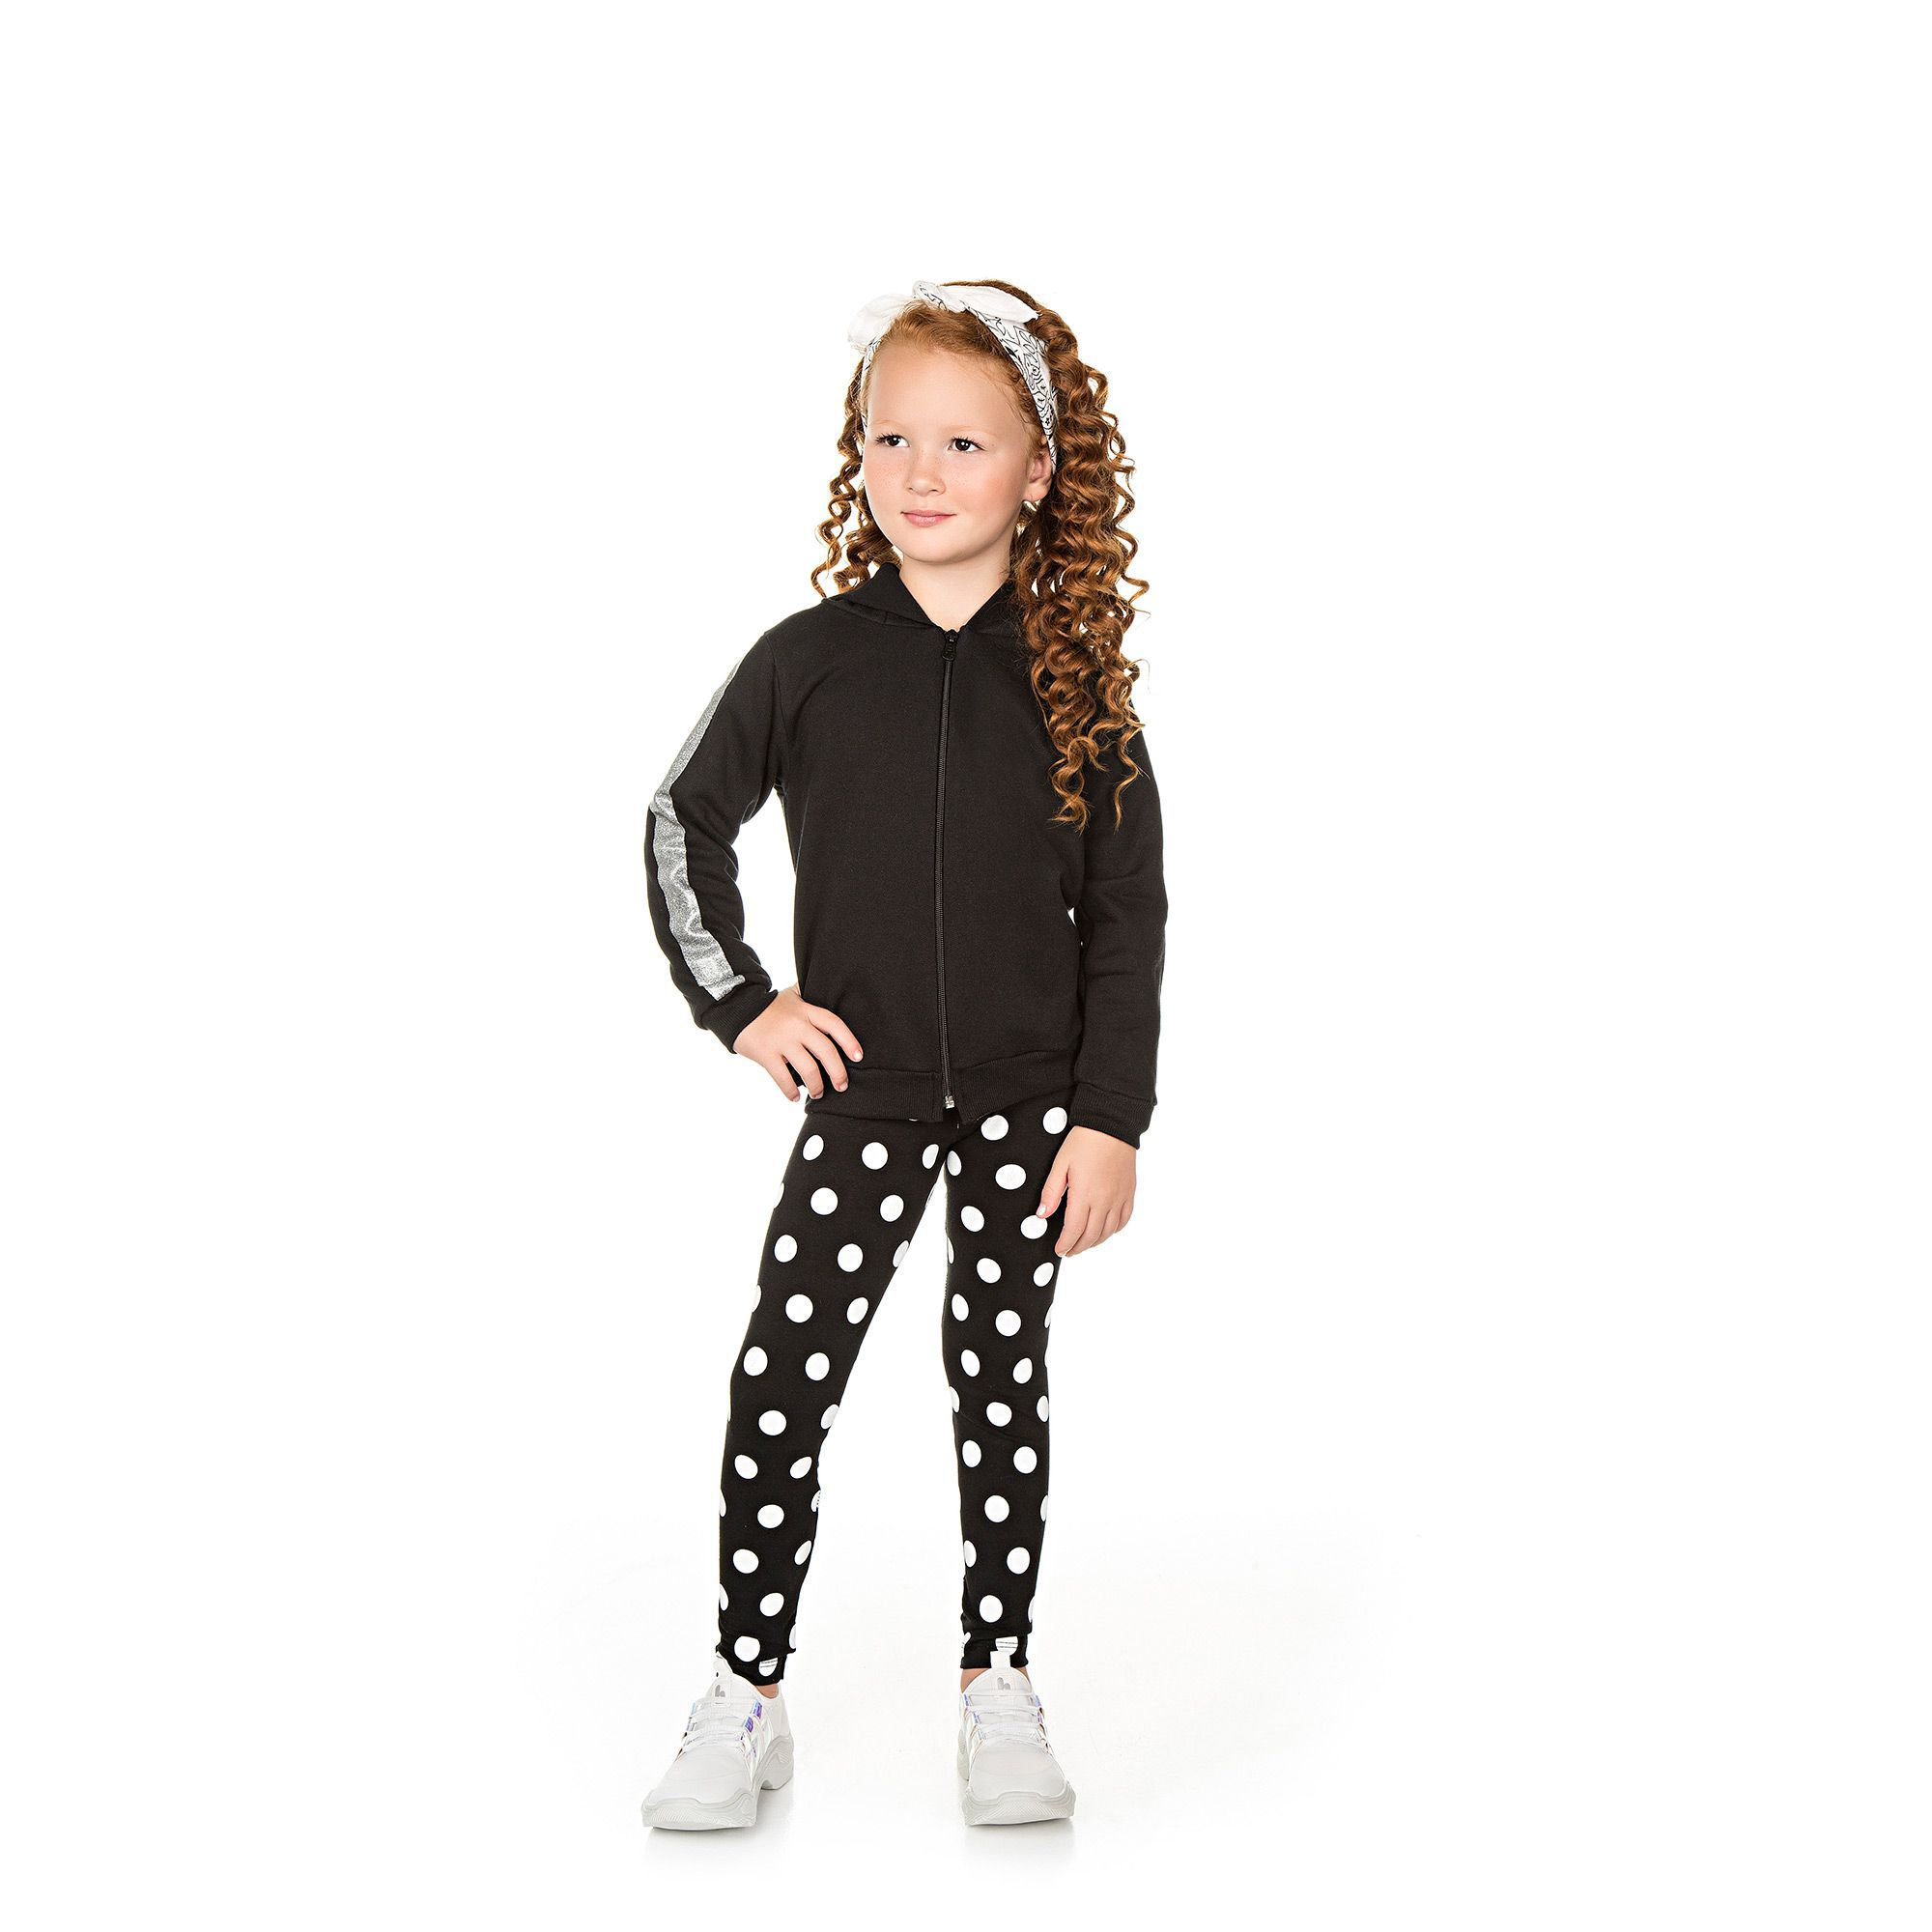 Conjunto Infantil Jaqueta e Legging  - Ref 4997 - Preto